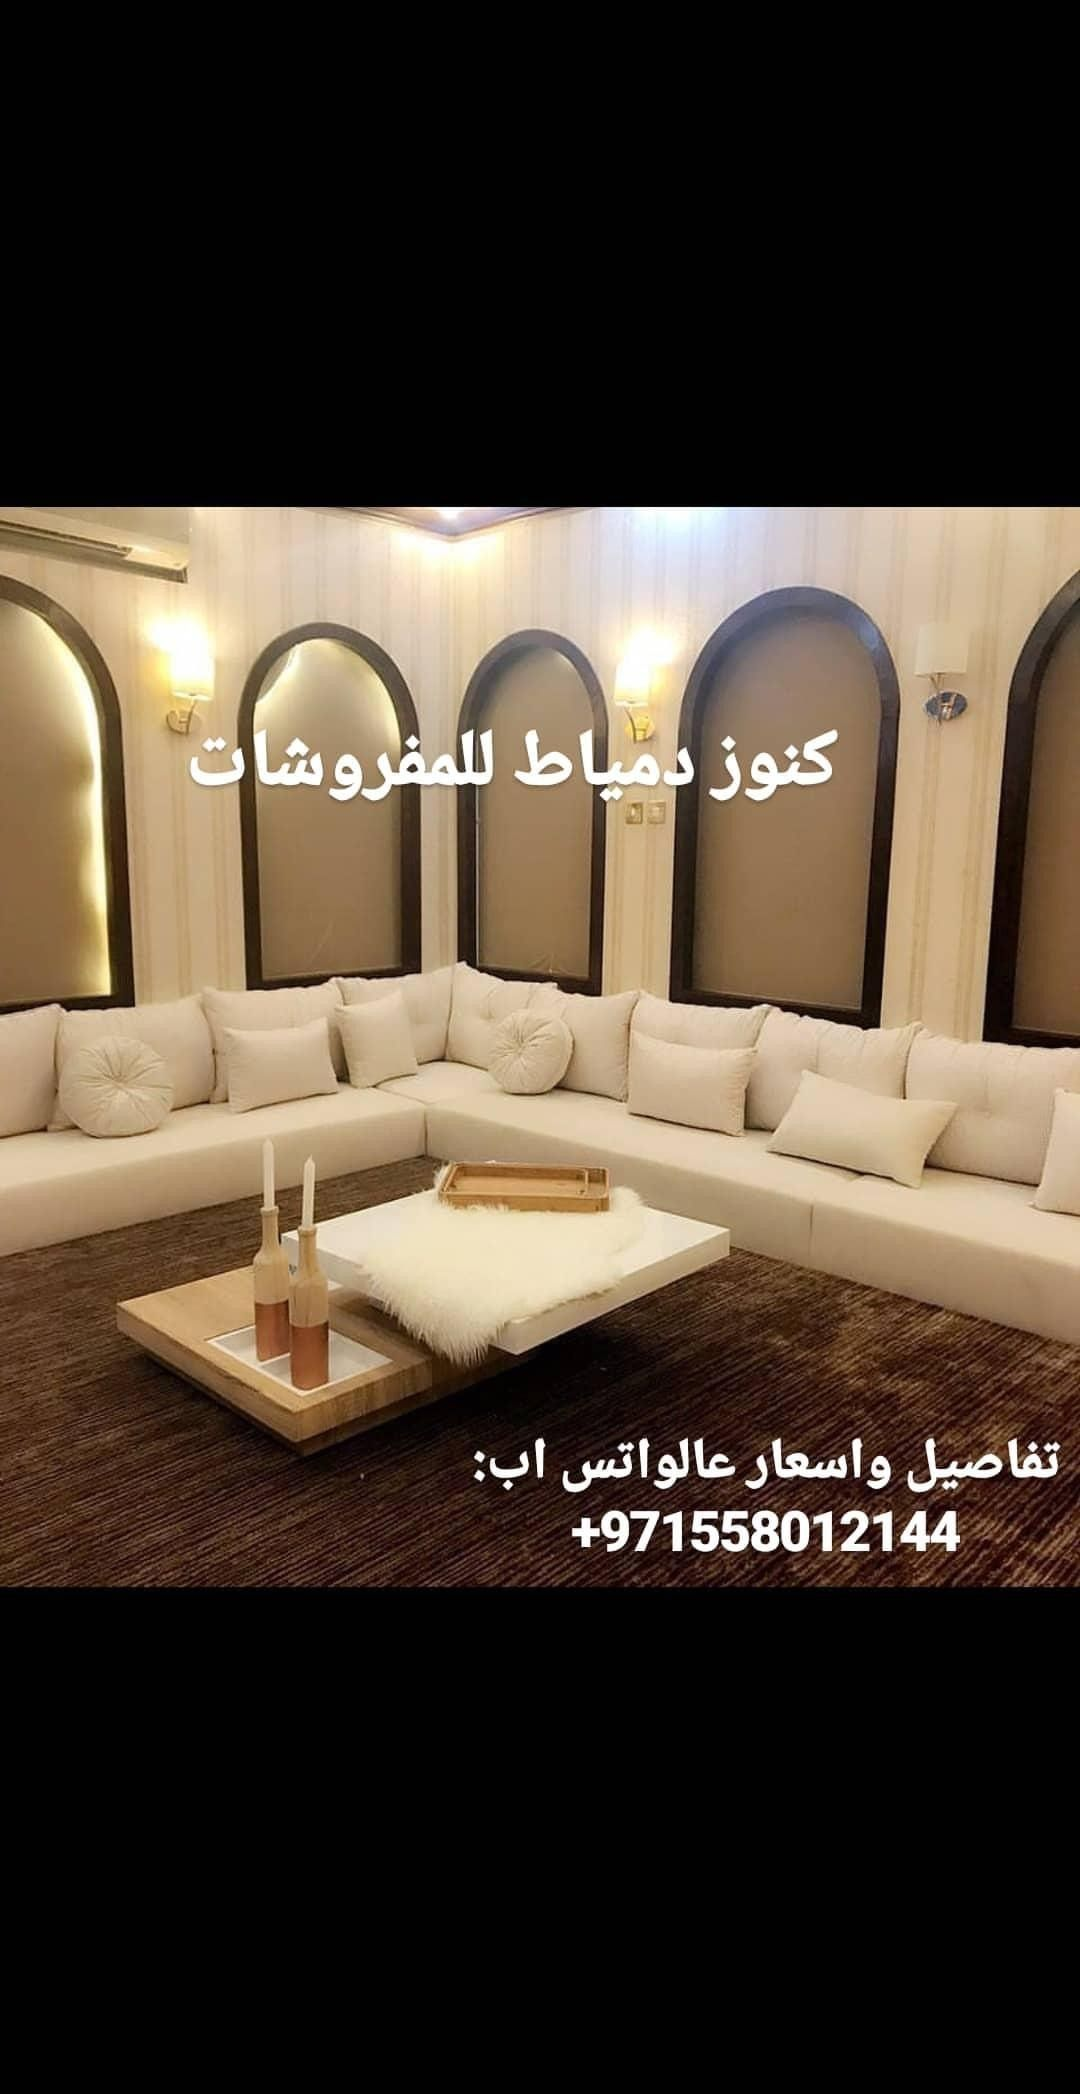 Pin By Majda Irshaid On جلسات عربيه Elegant Living Room Design Elegant Living Room Elegant Living